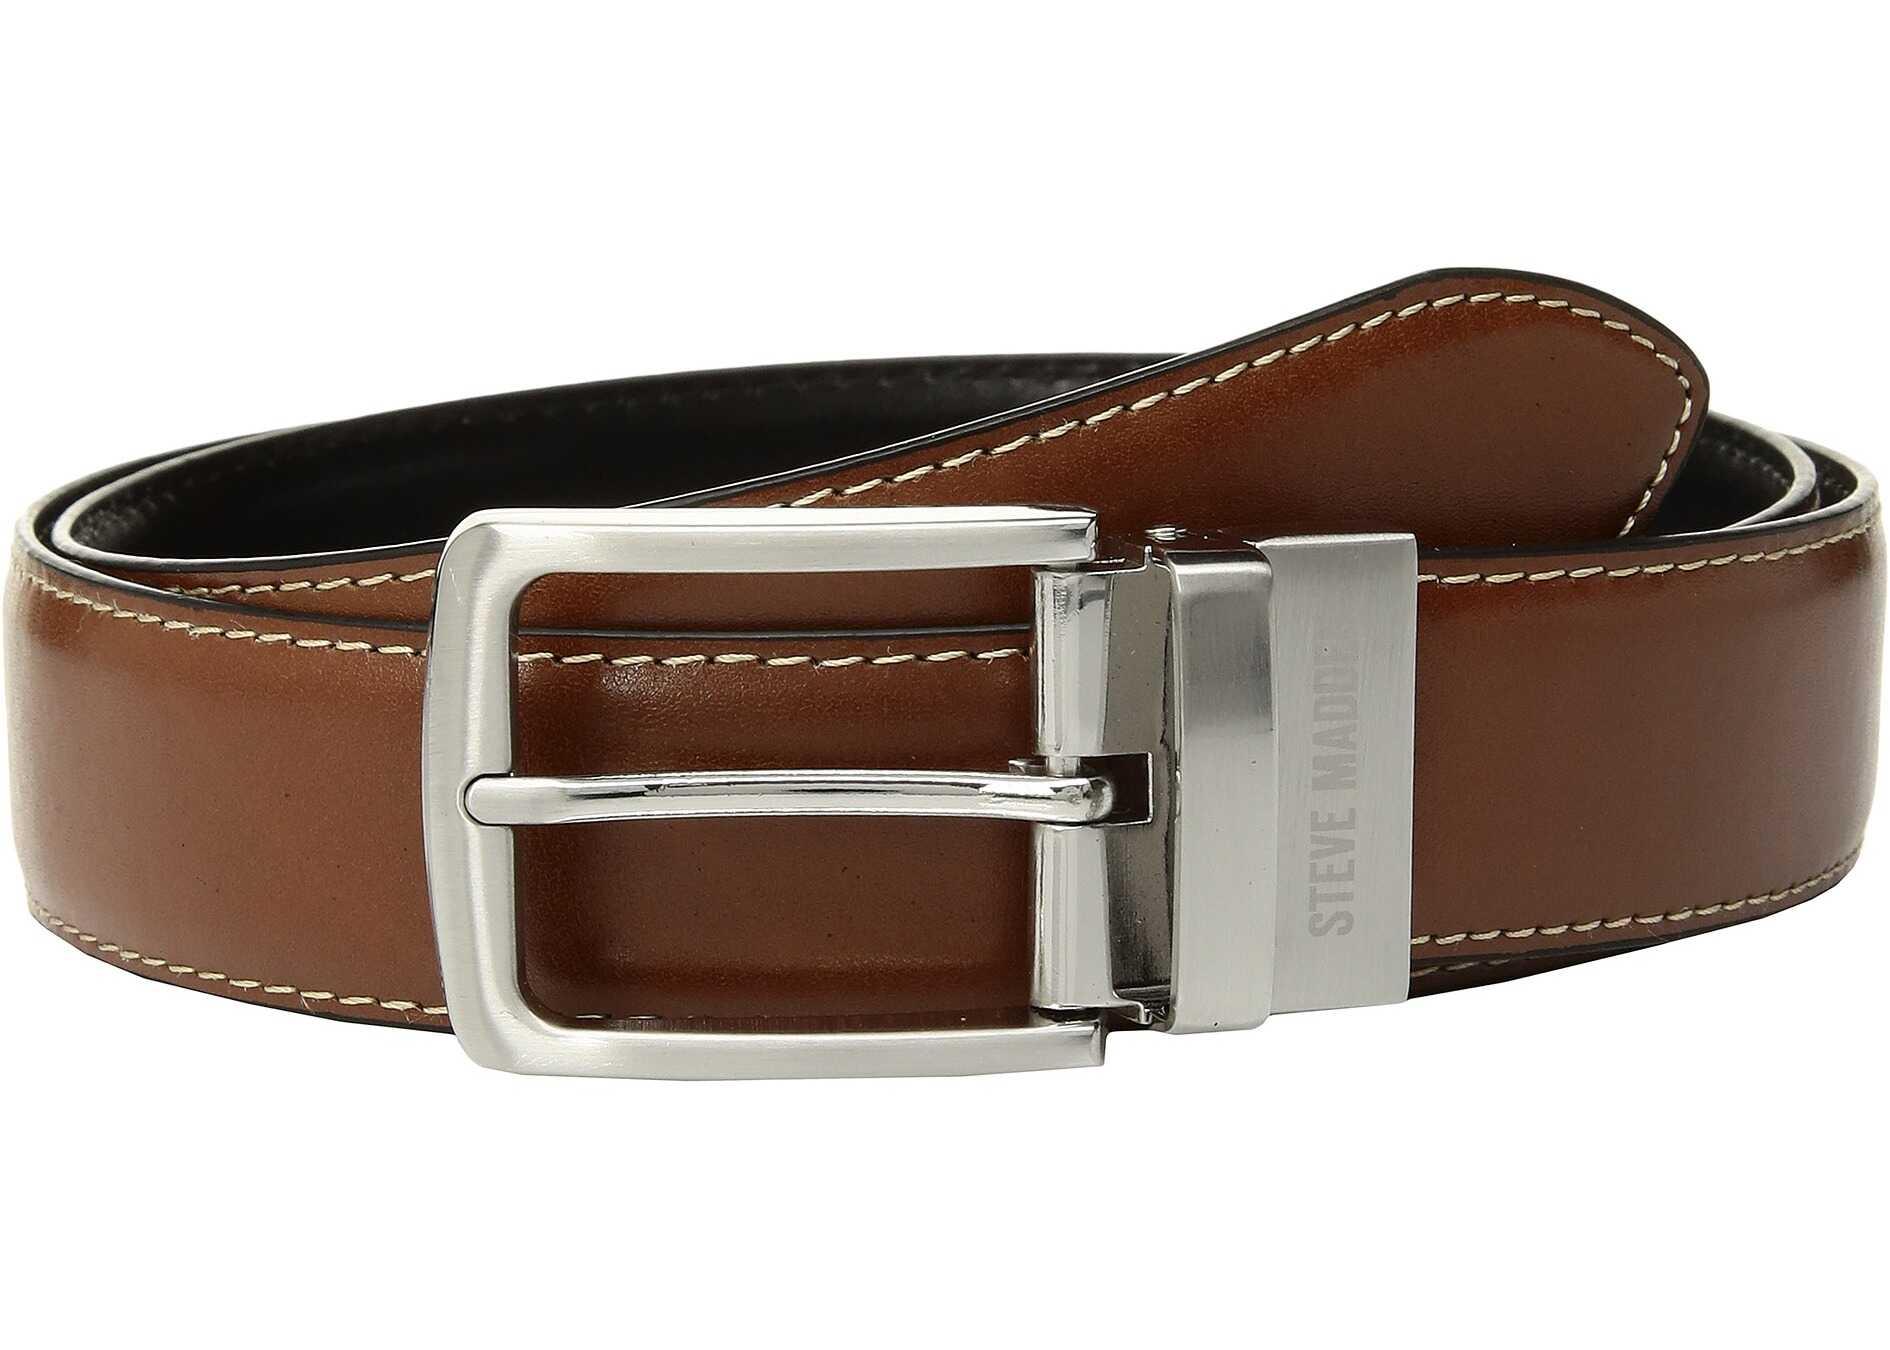 Steve Madden 35mm Casual Reversible Belt Cognac/Black